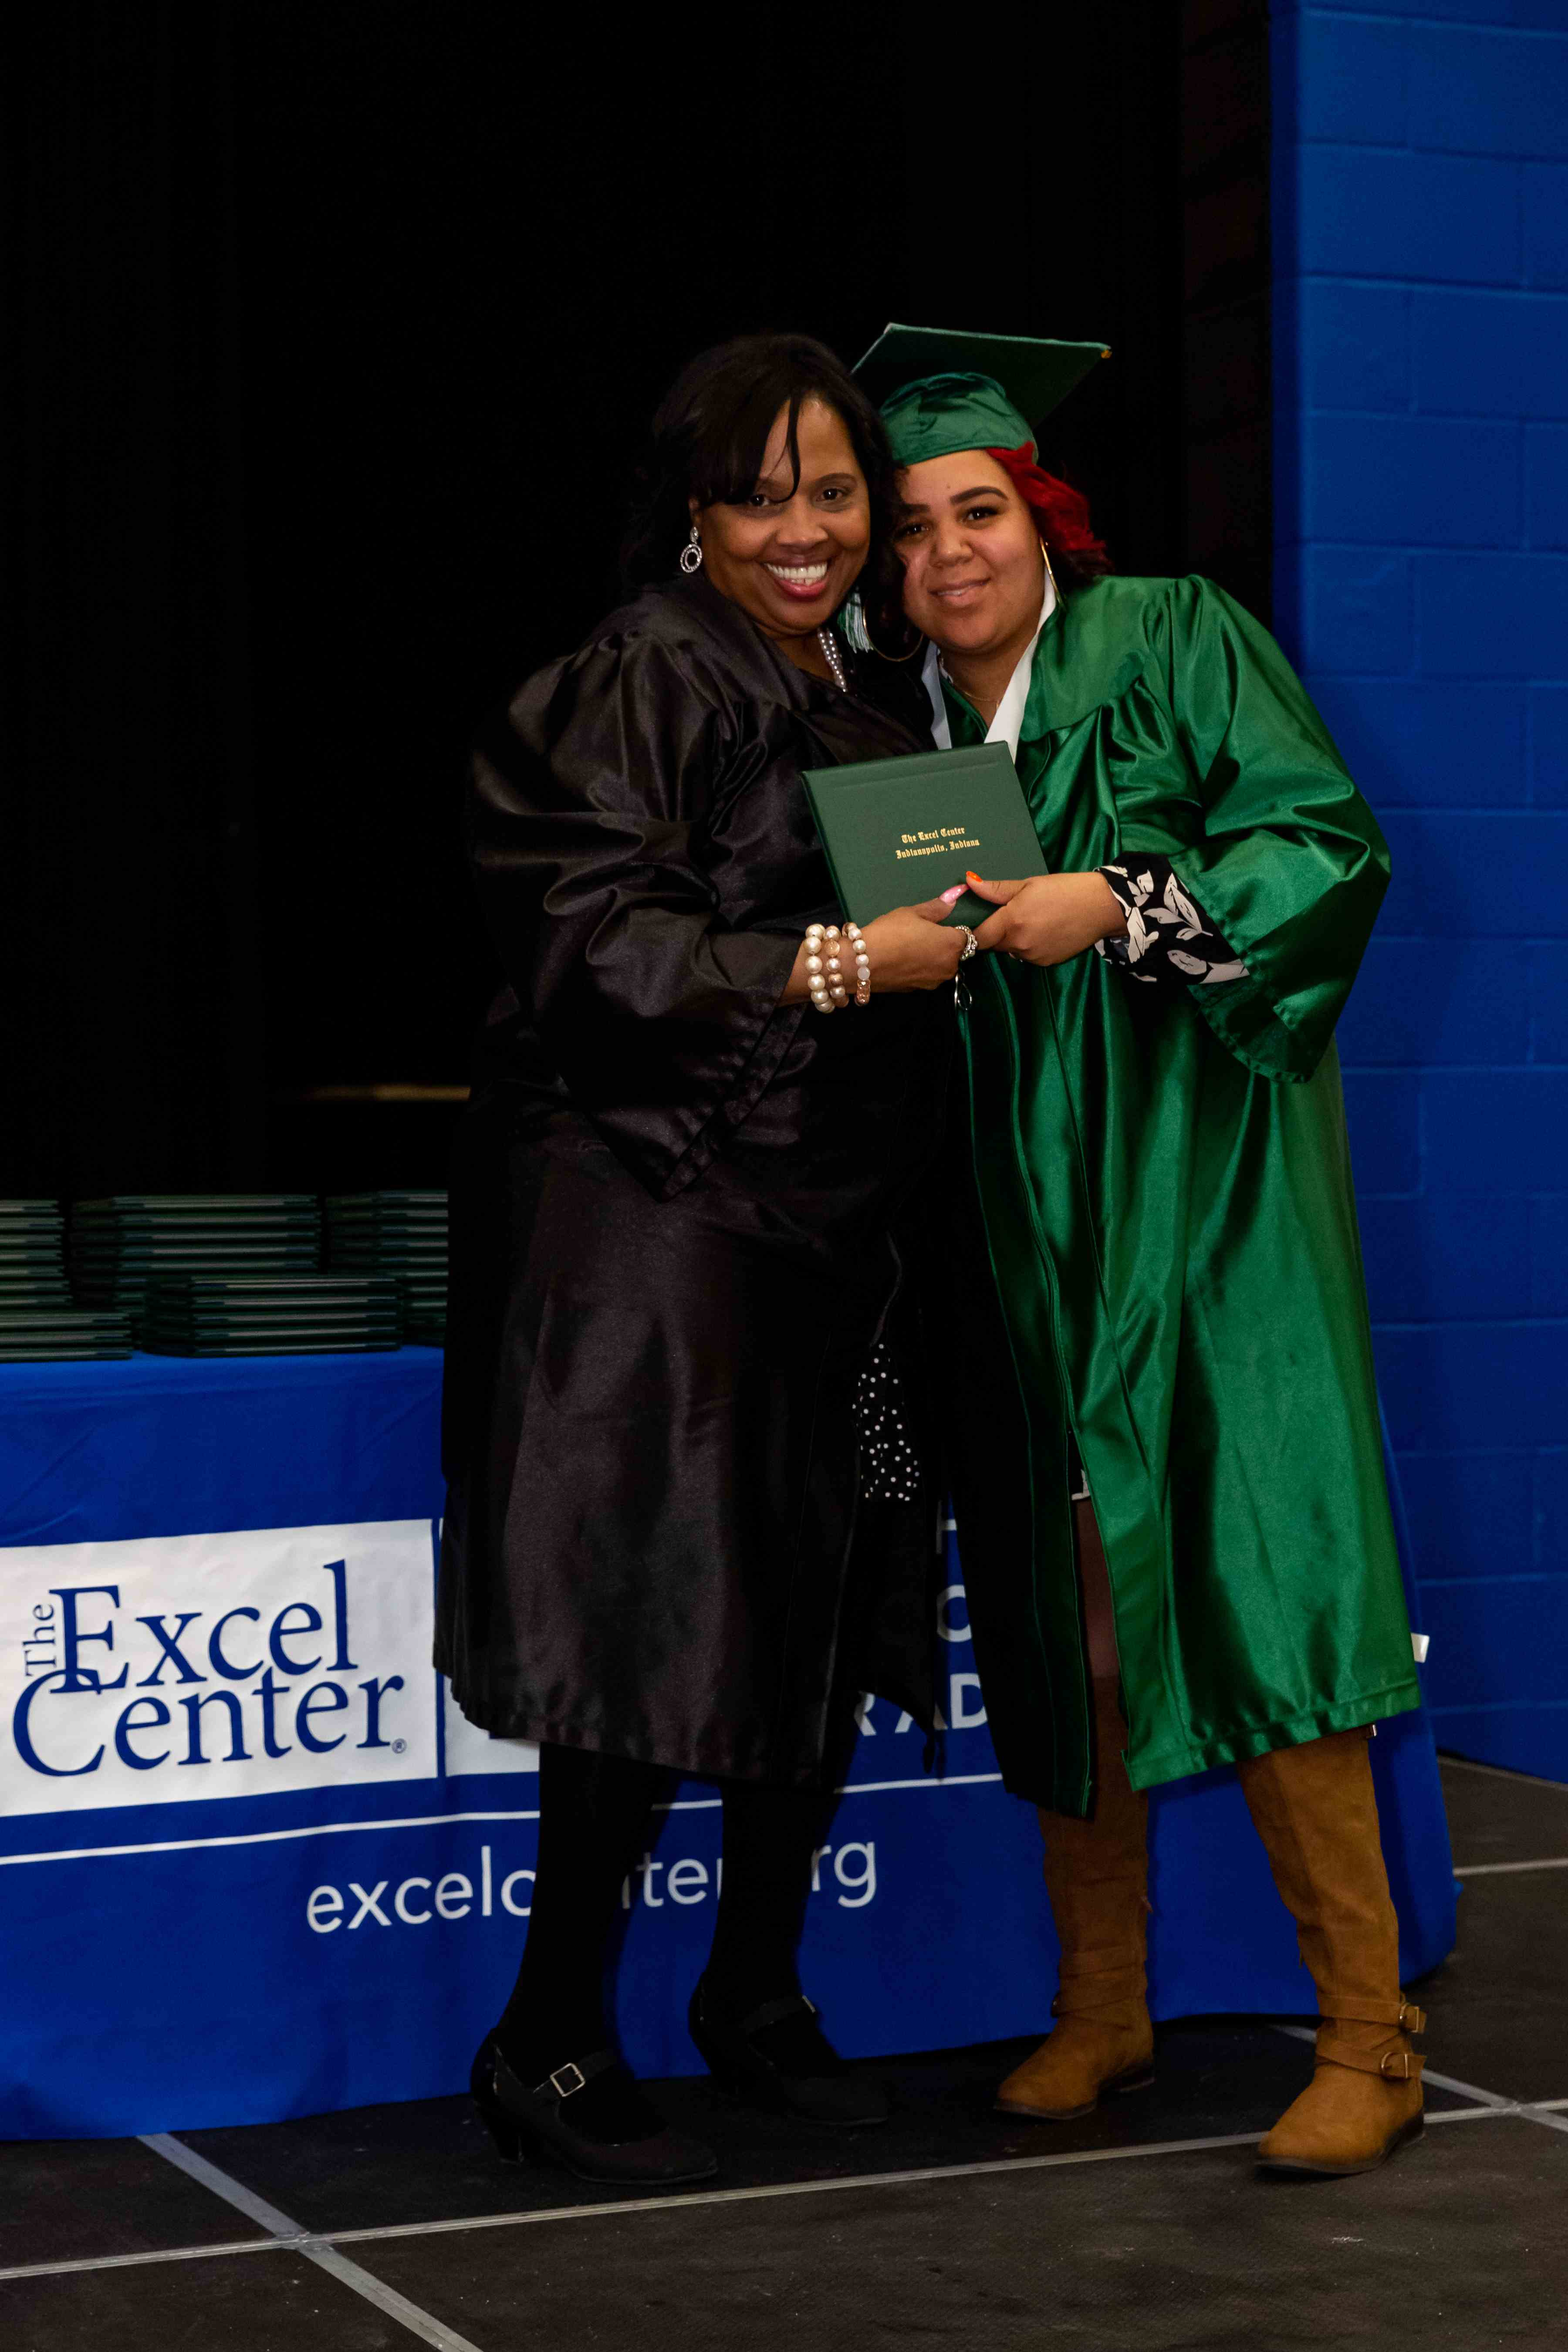 Excel_Center_Graduation_February 14, 2019_Tony_Vasquez_187_